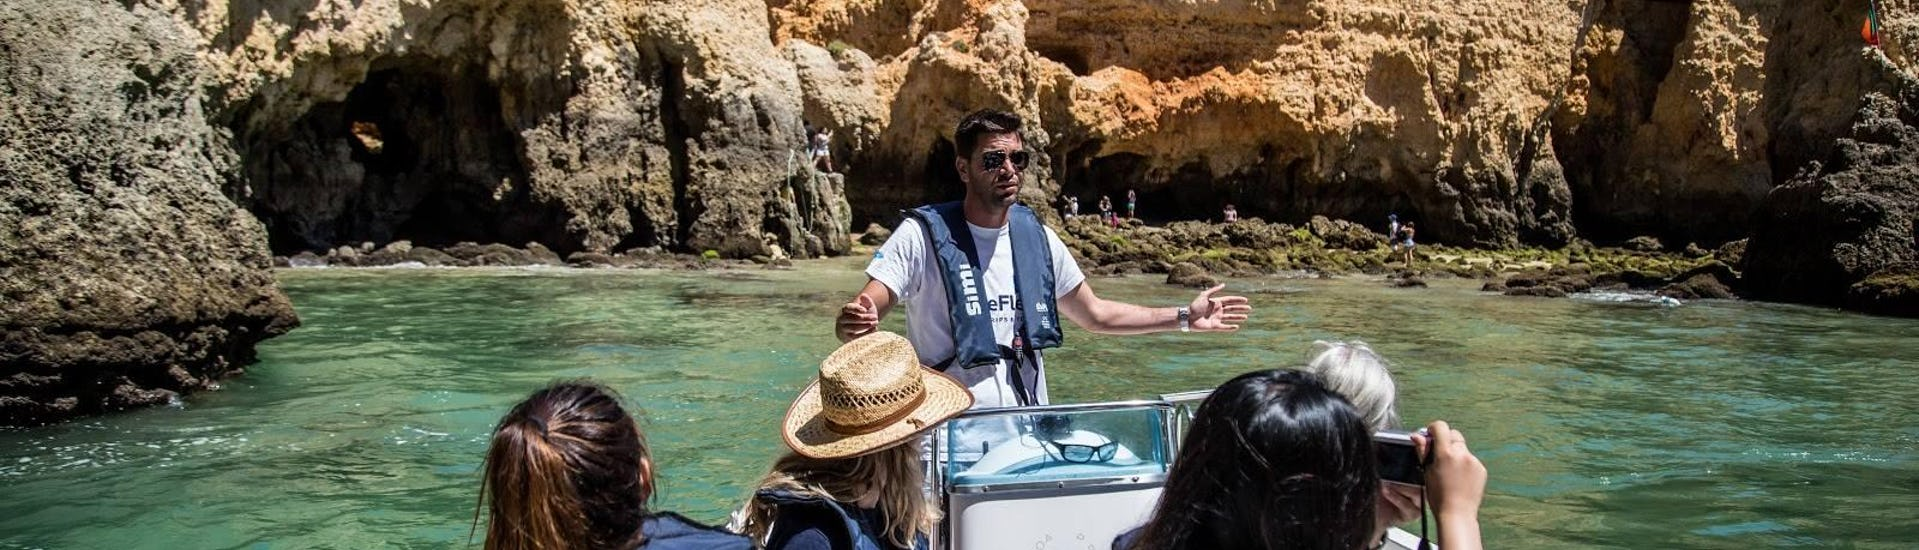 Boat Trip from Lagos to Ponta Da Piedade - November to May